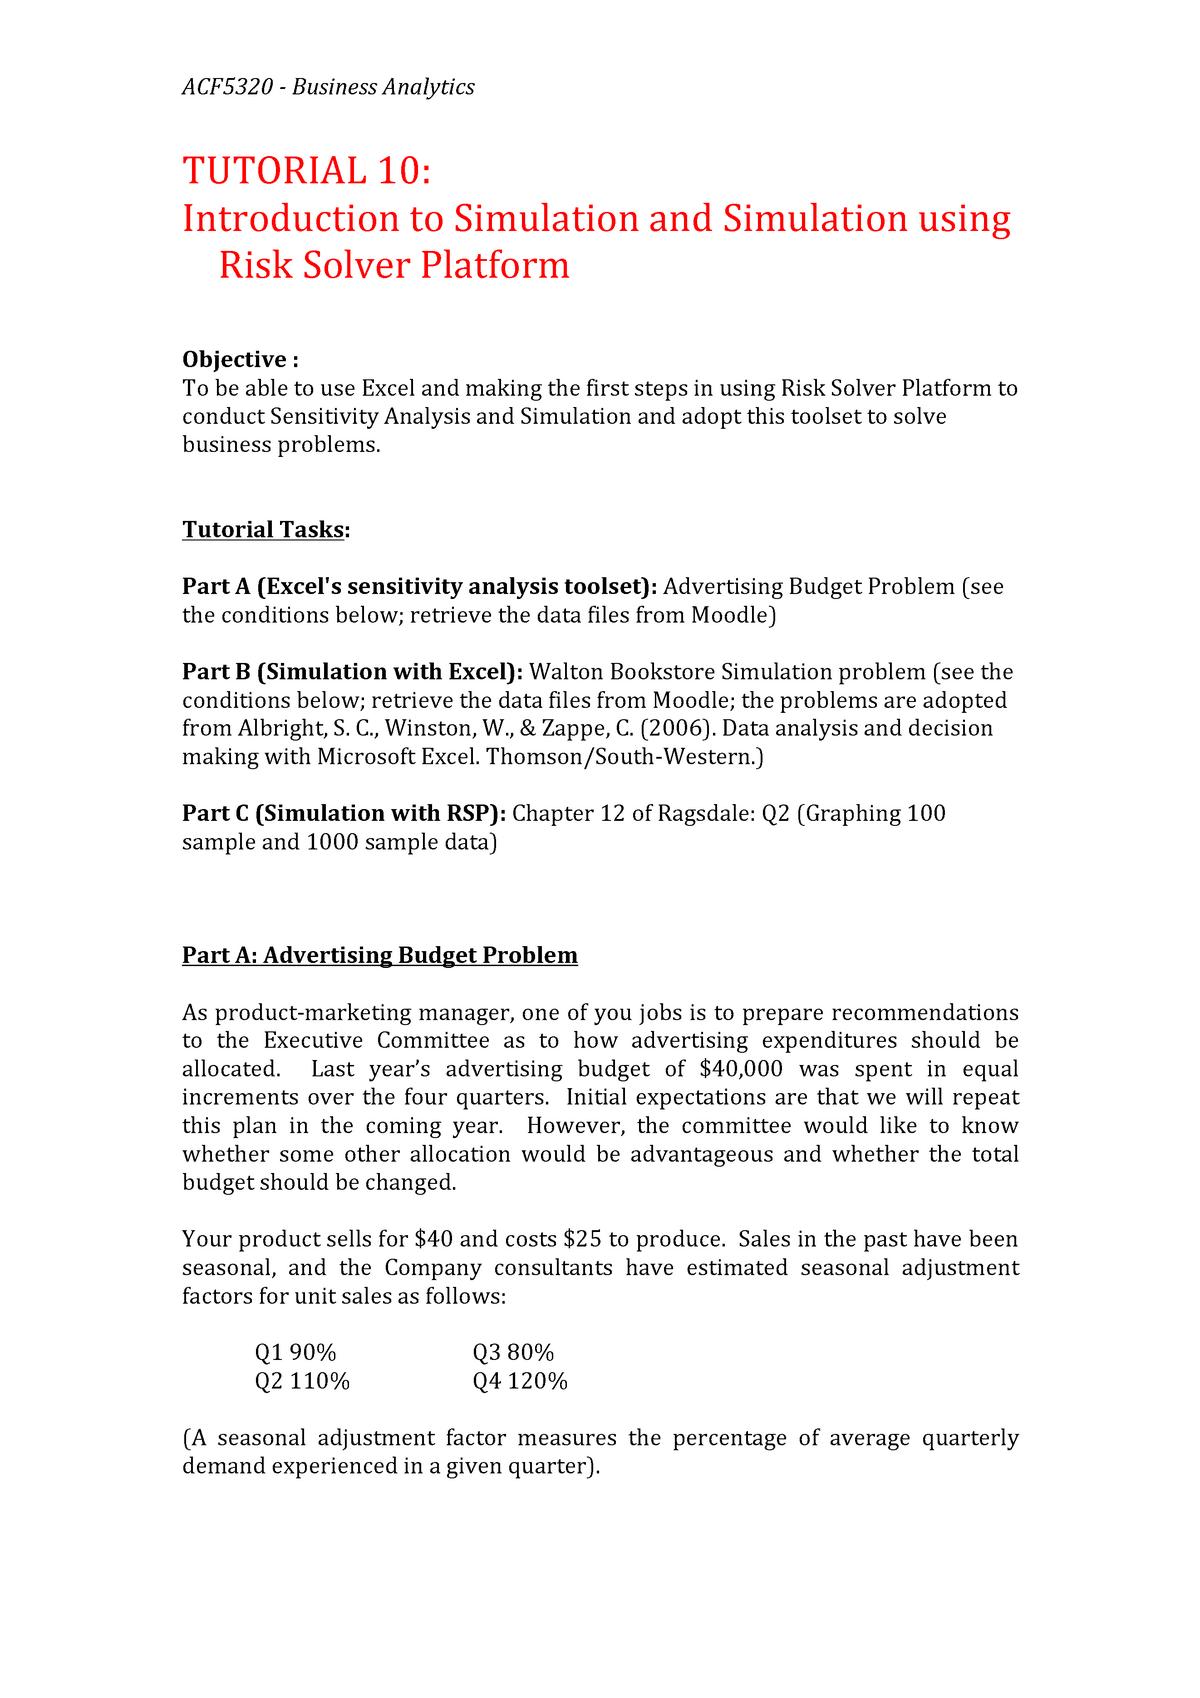 Tutorial work 1, Business Analytics, Tutorial 10 questions - ACF5320